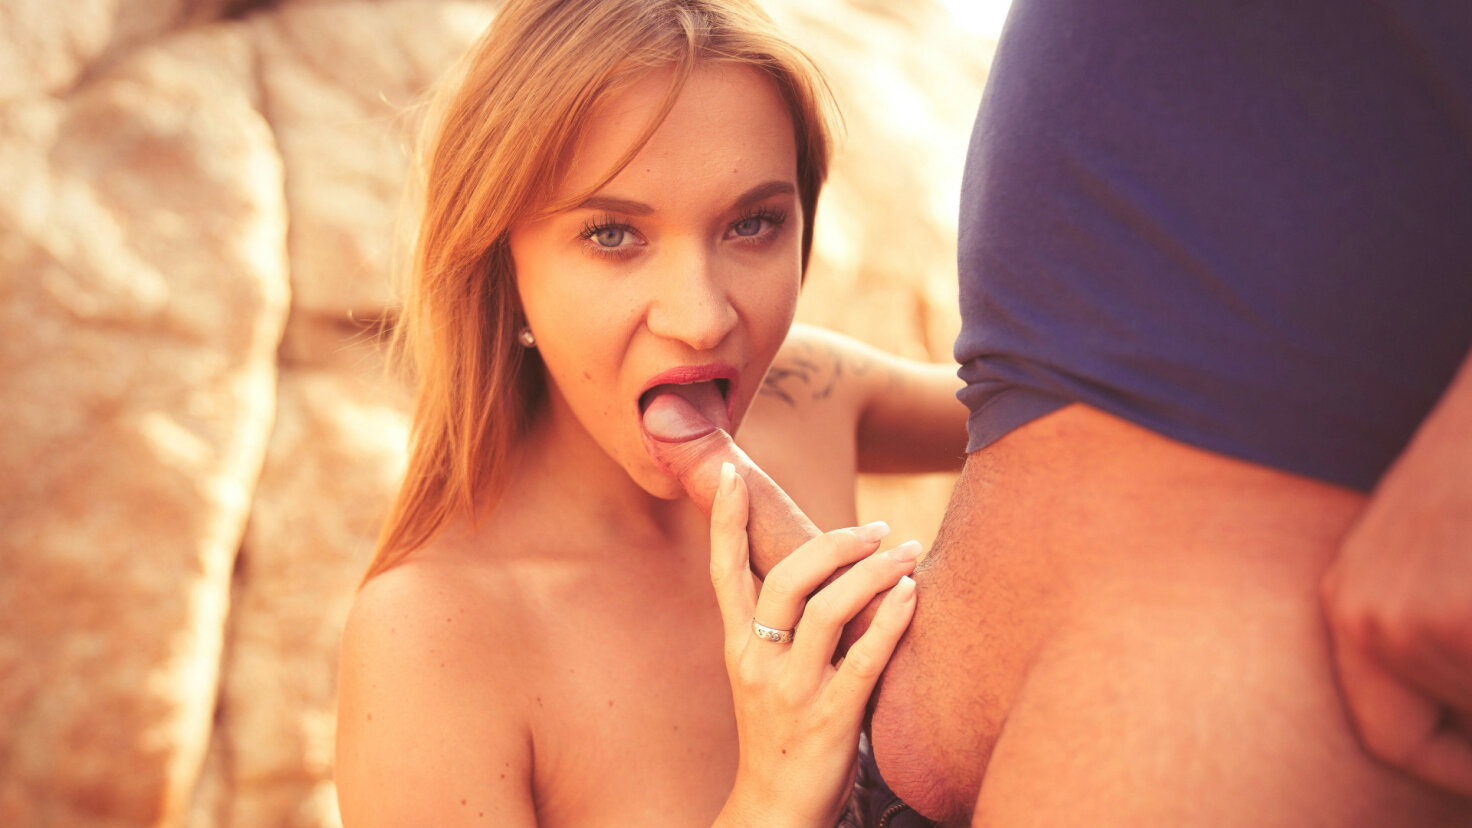 Hot blowjob on the beach